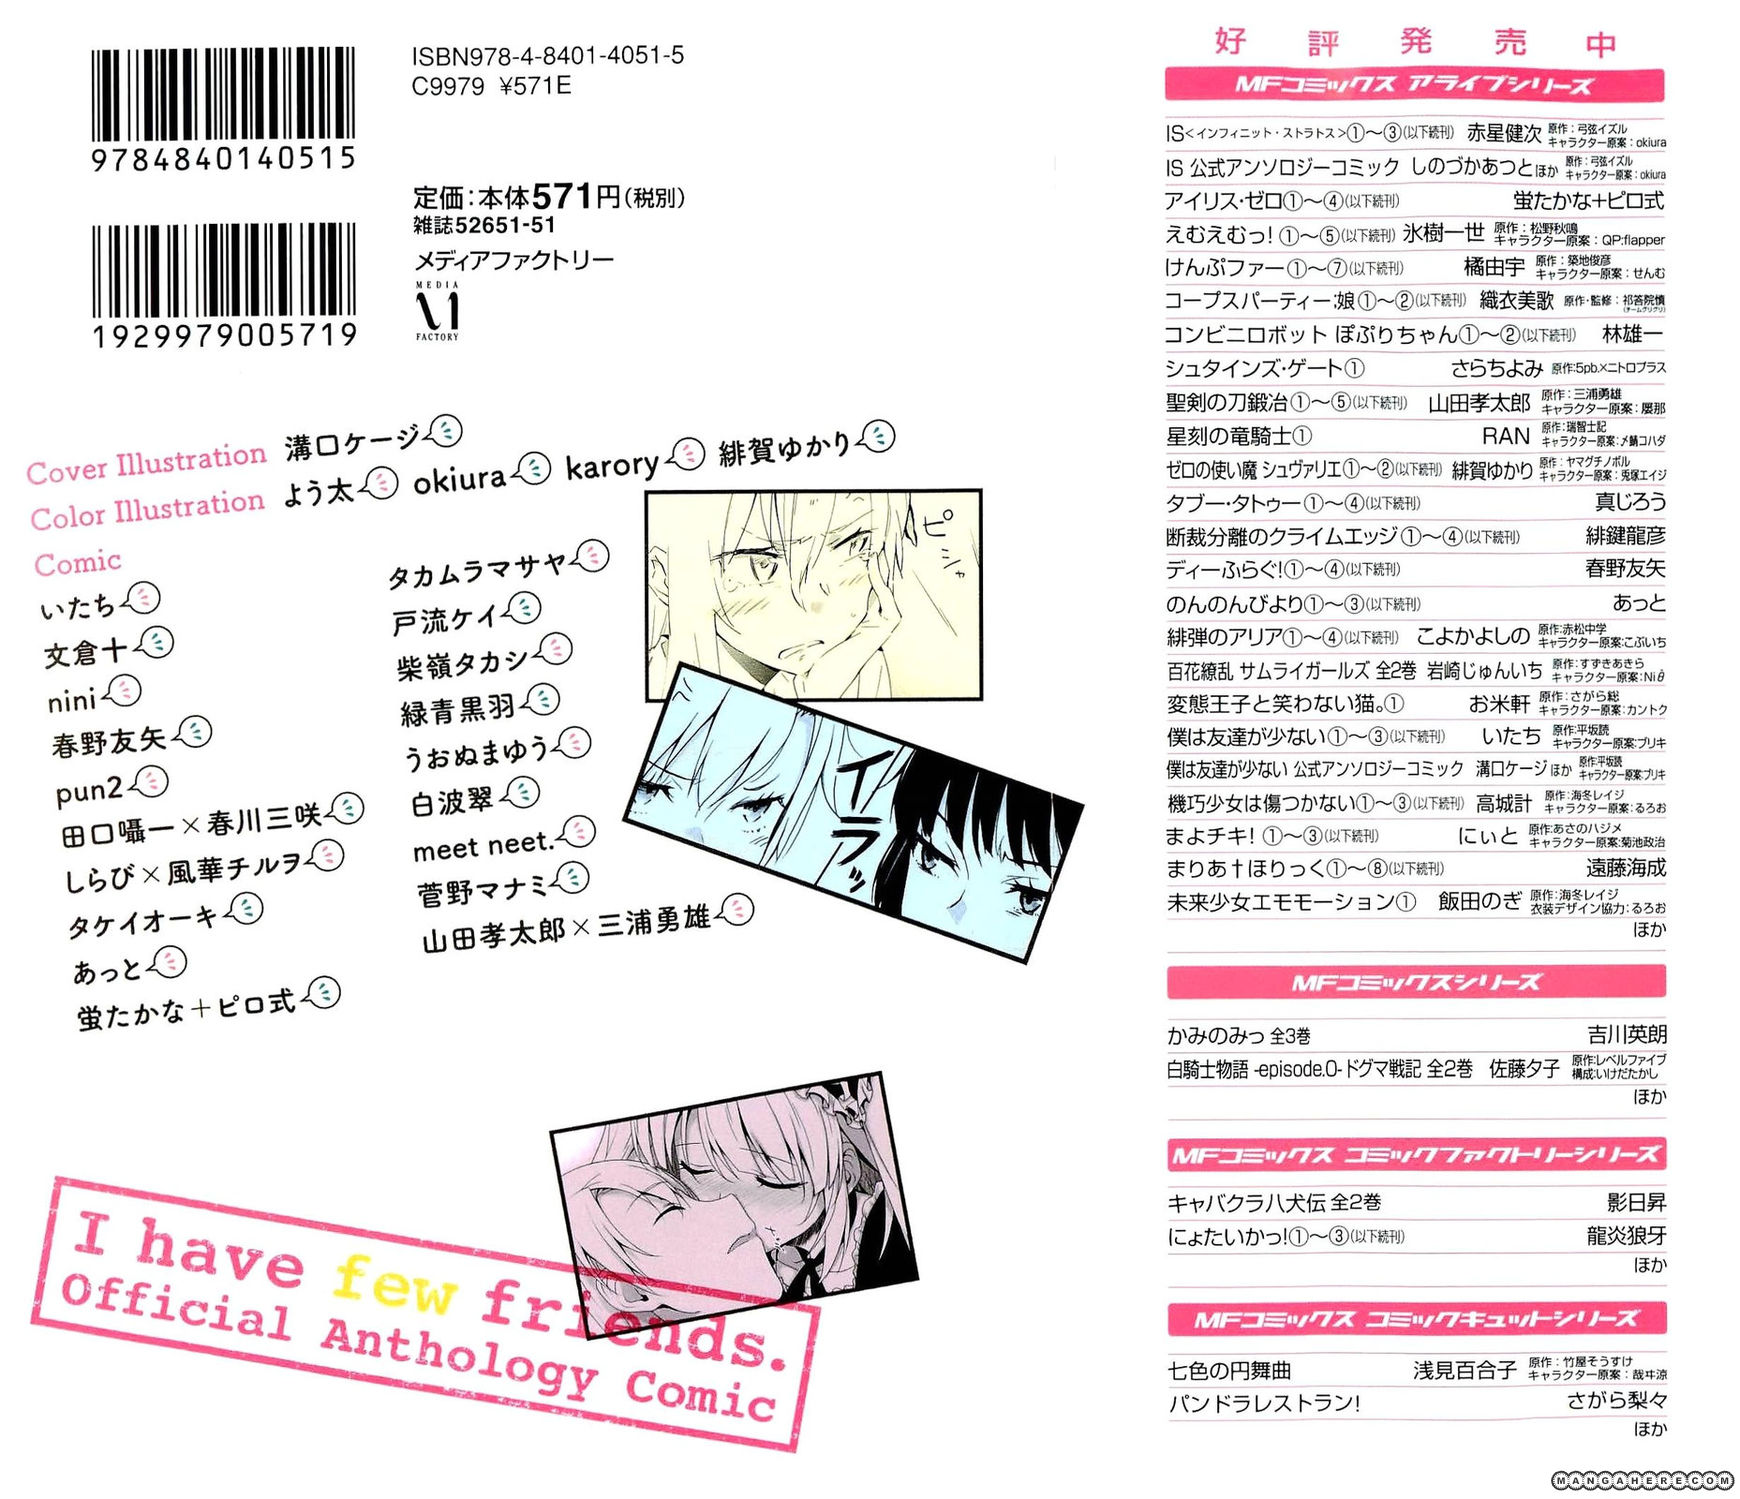 Boku wa Tomodachi ga Sukunai - Koushiki Anthology Comic 1 Page 2